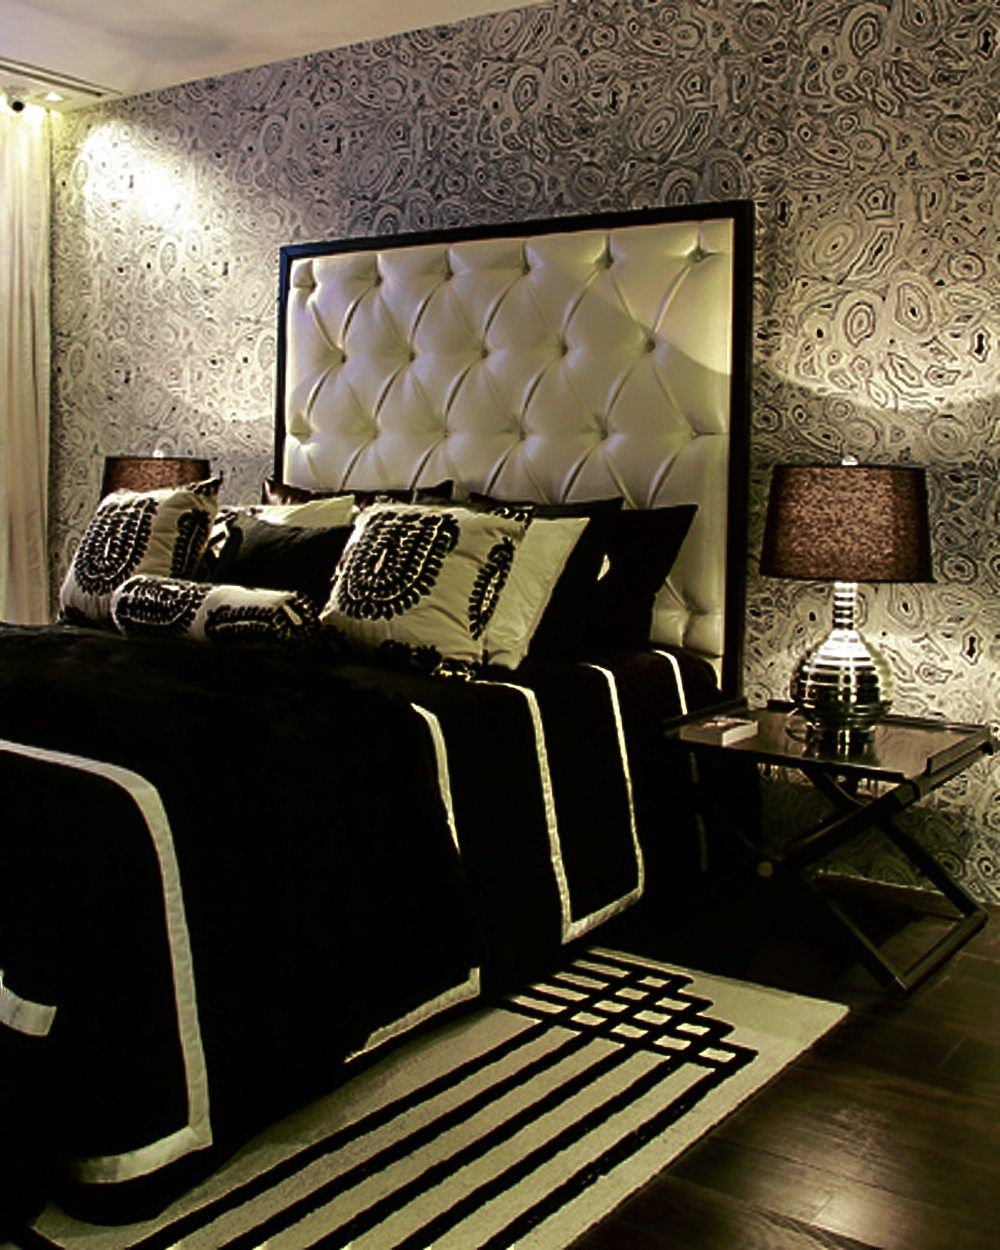 elegant headboard  Bedrooms  Pinterest